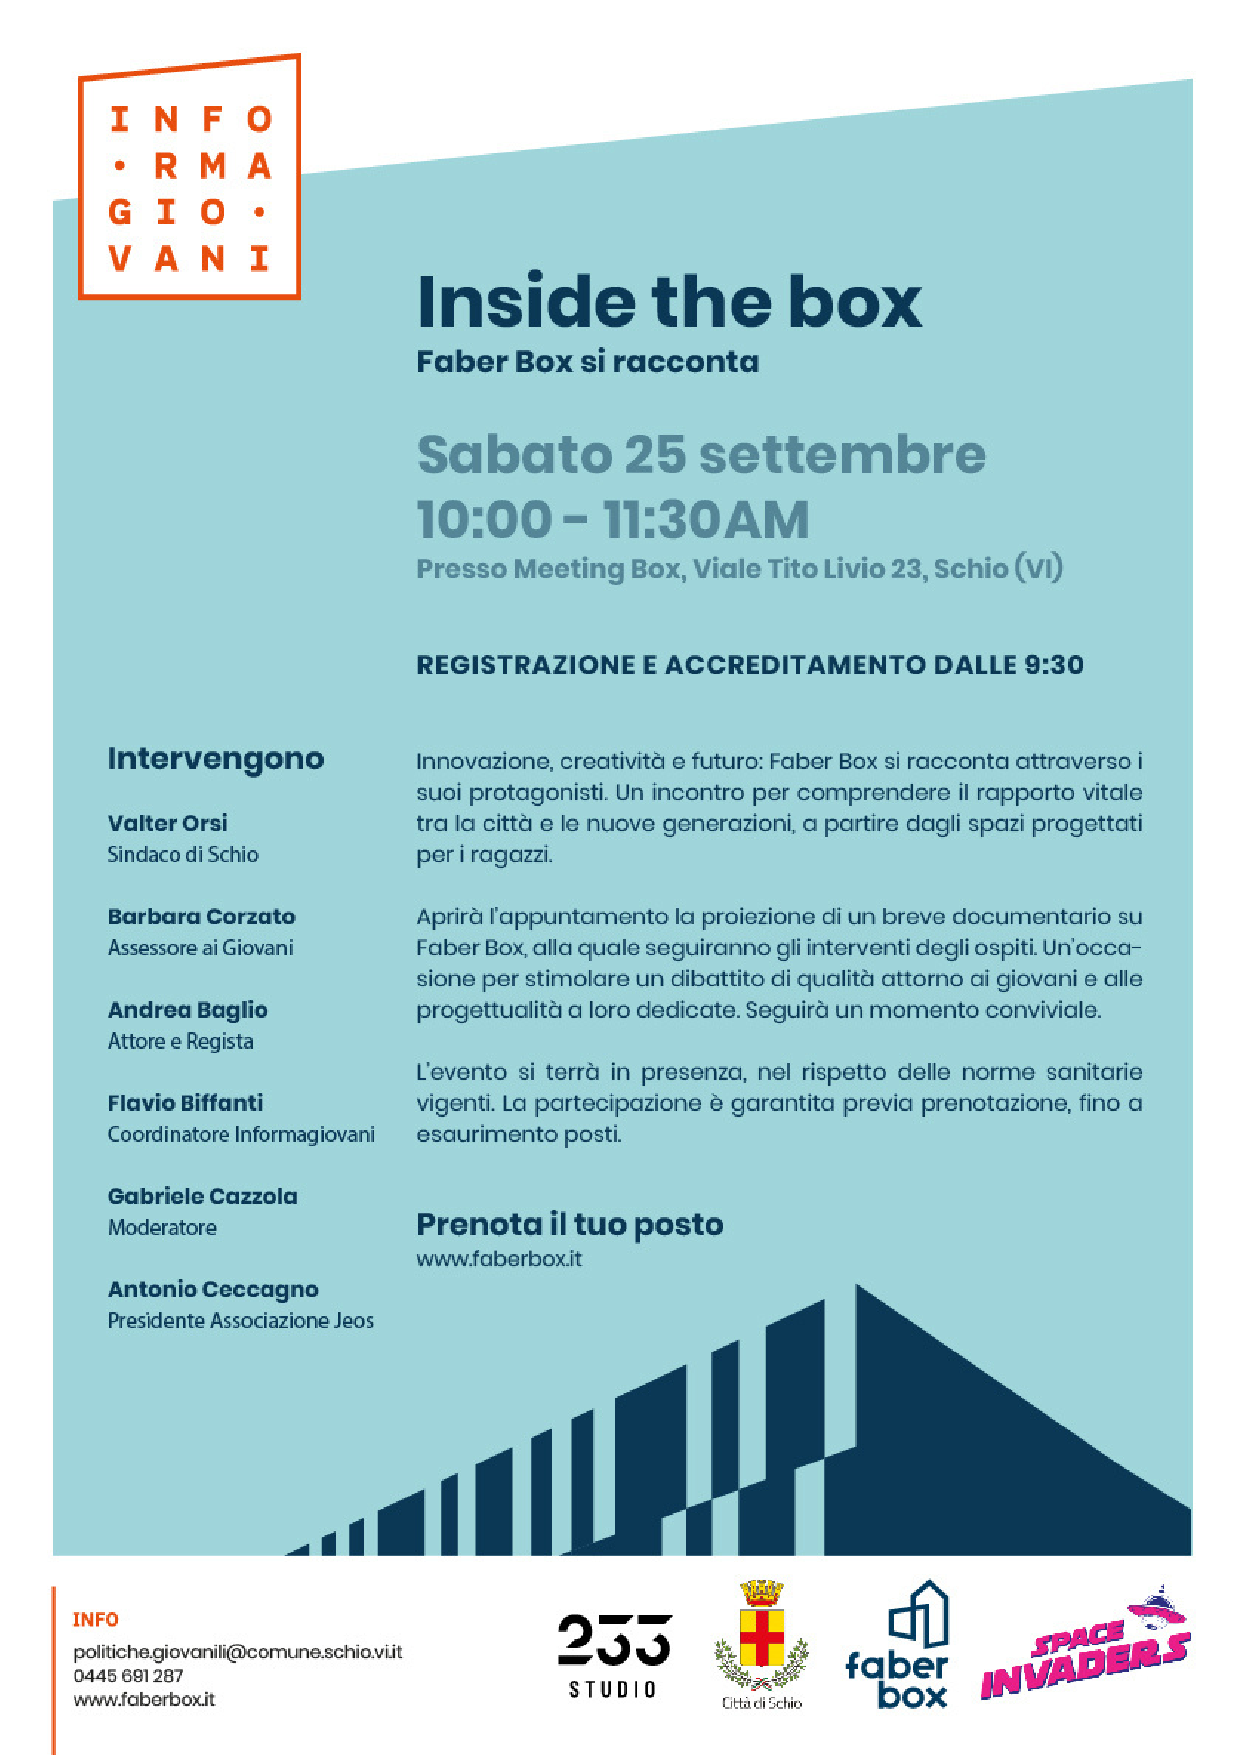 Inside the box – Faber Box si racconta